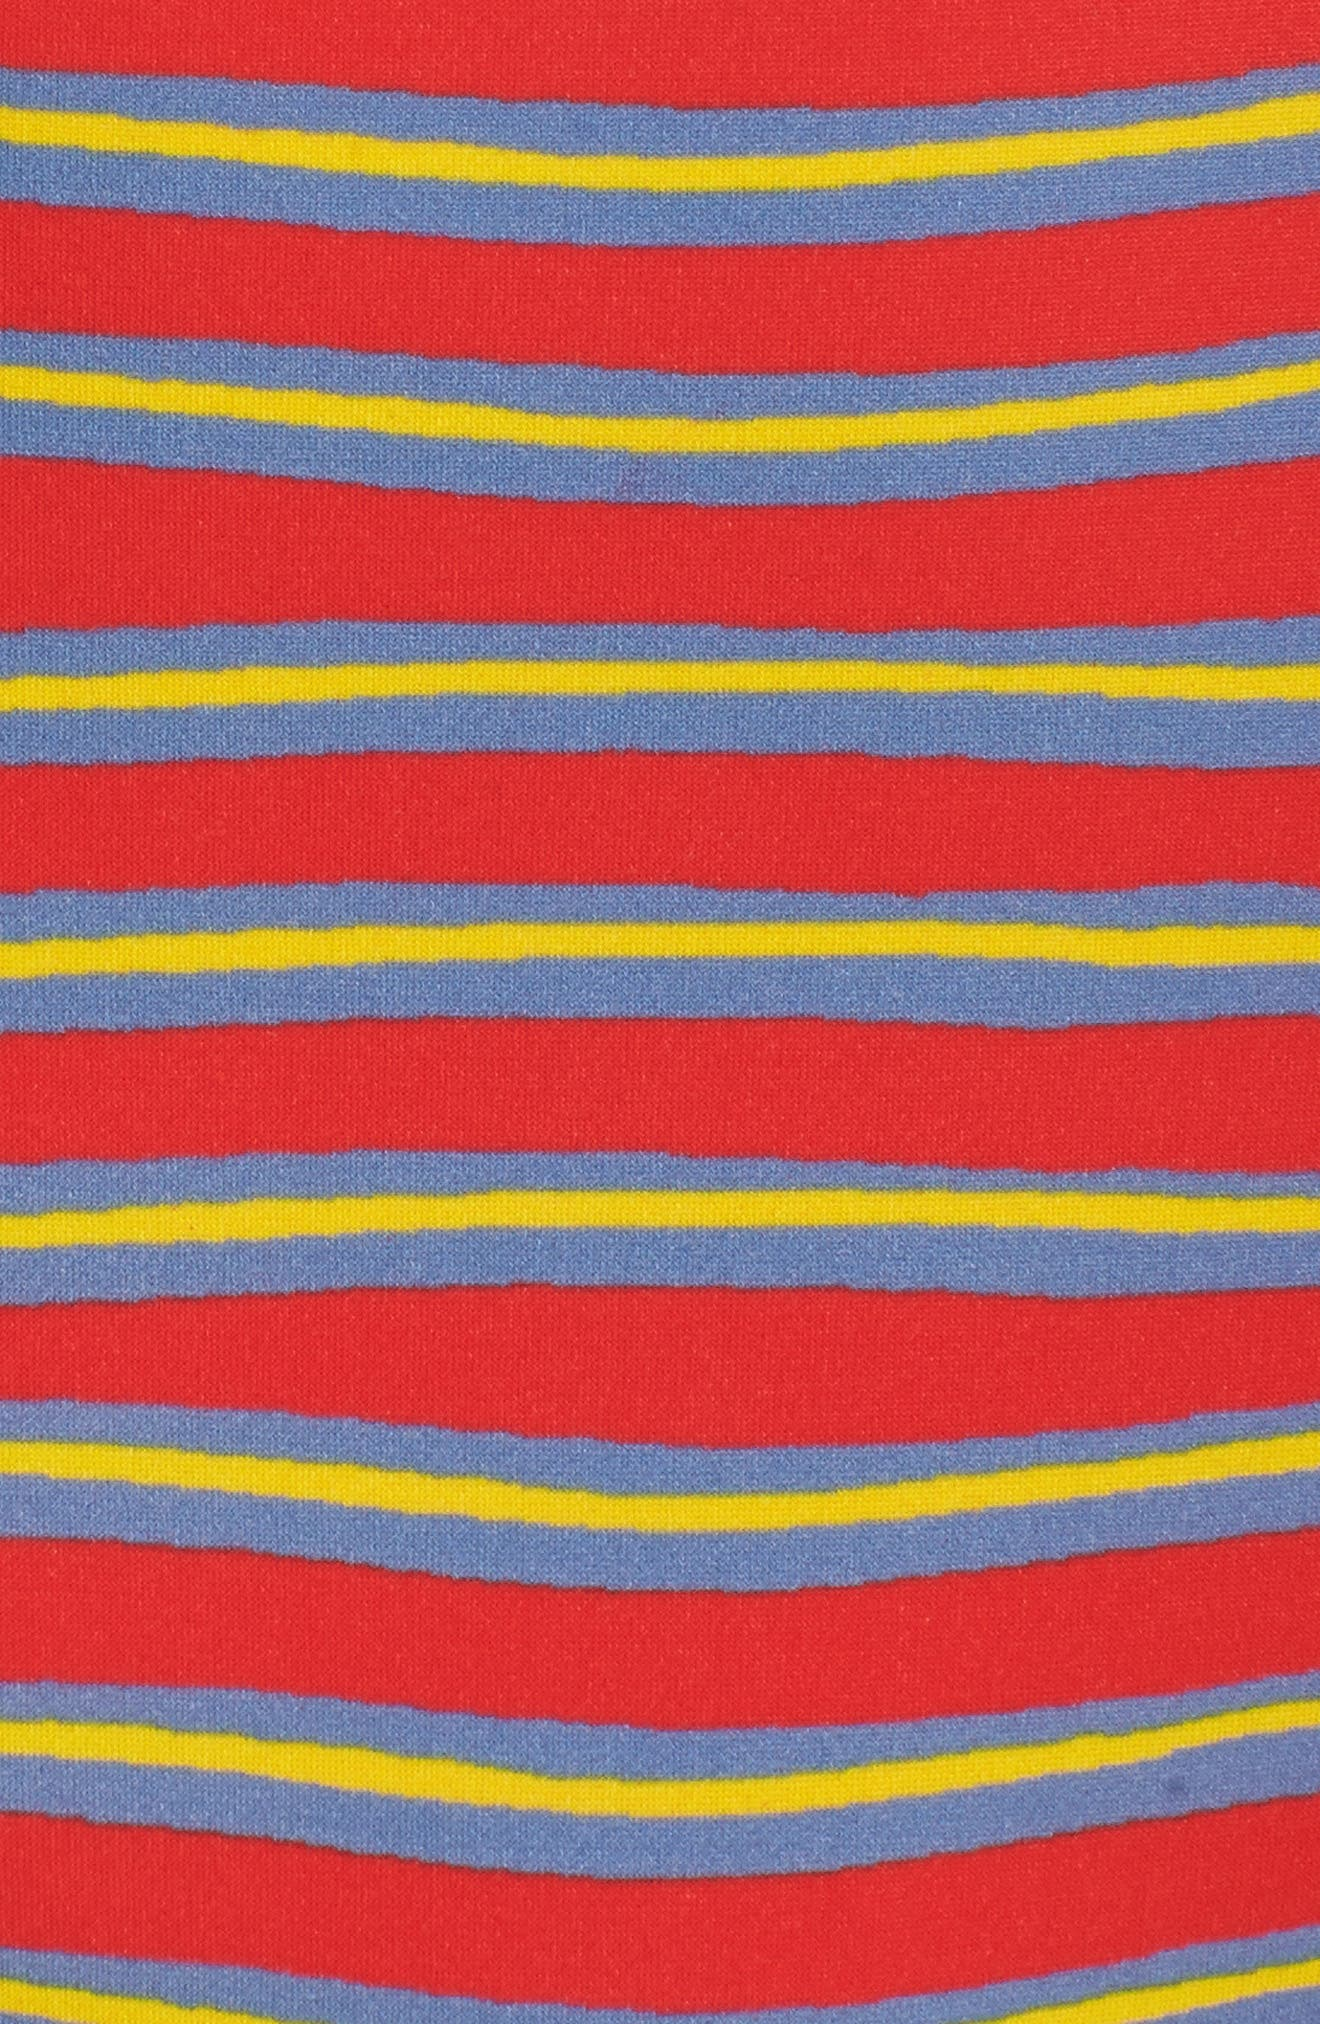 Strapless Bikini Top,                             Alternate thumbnail 9, color,                             Bodin Stripe Bright Red